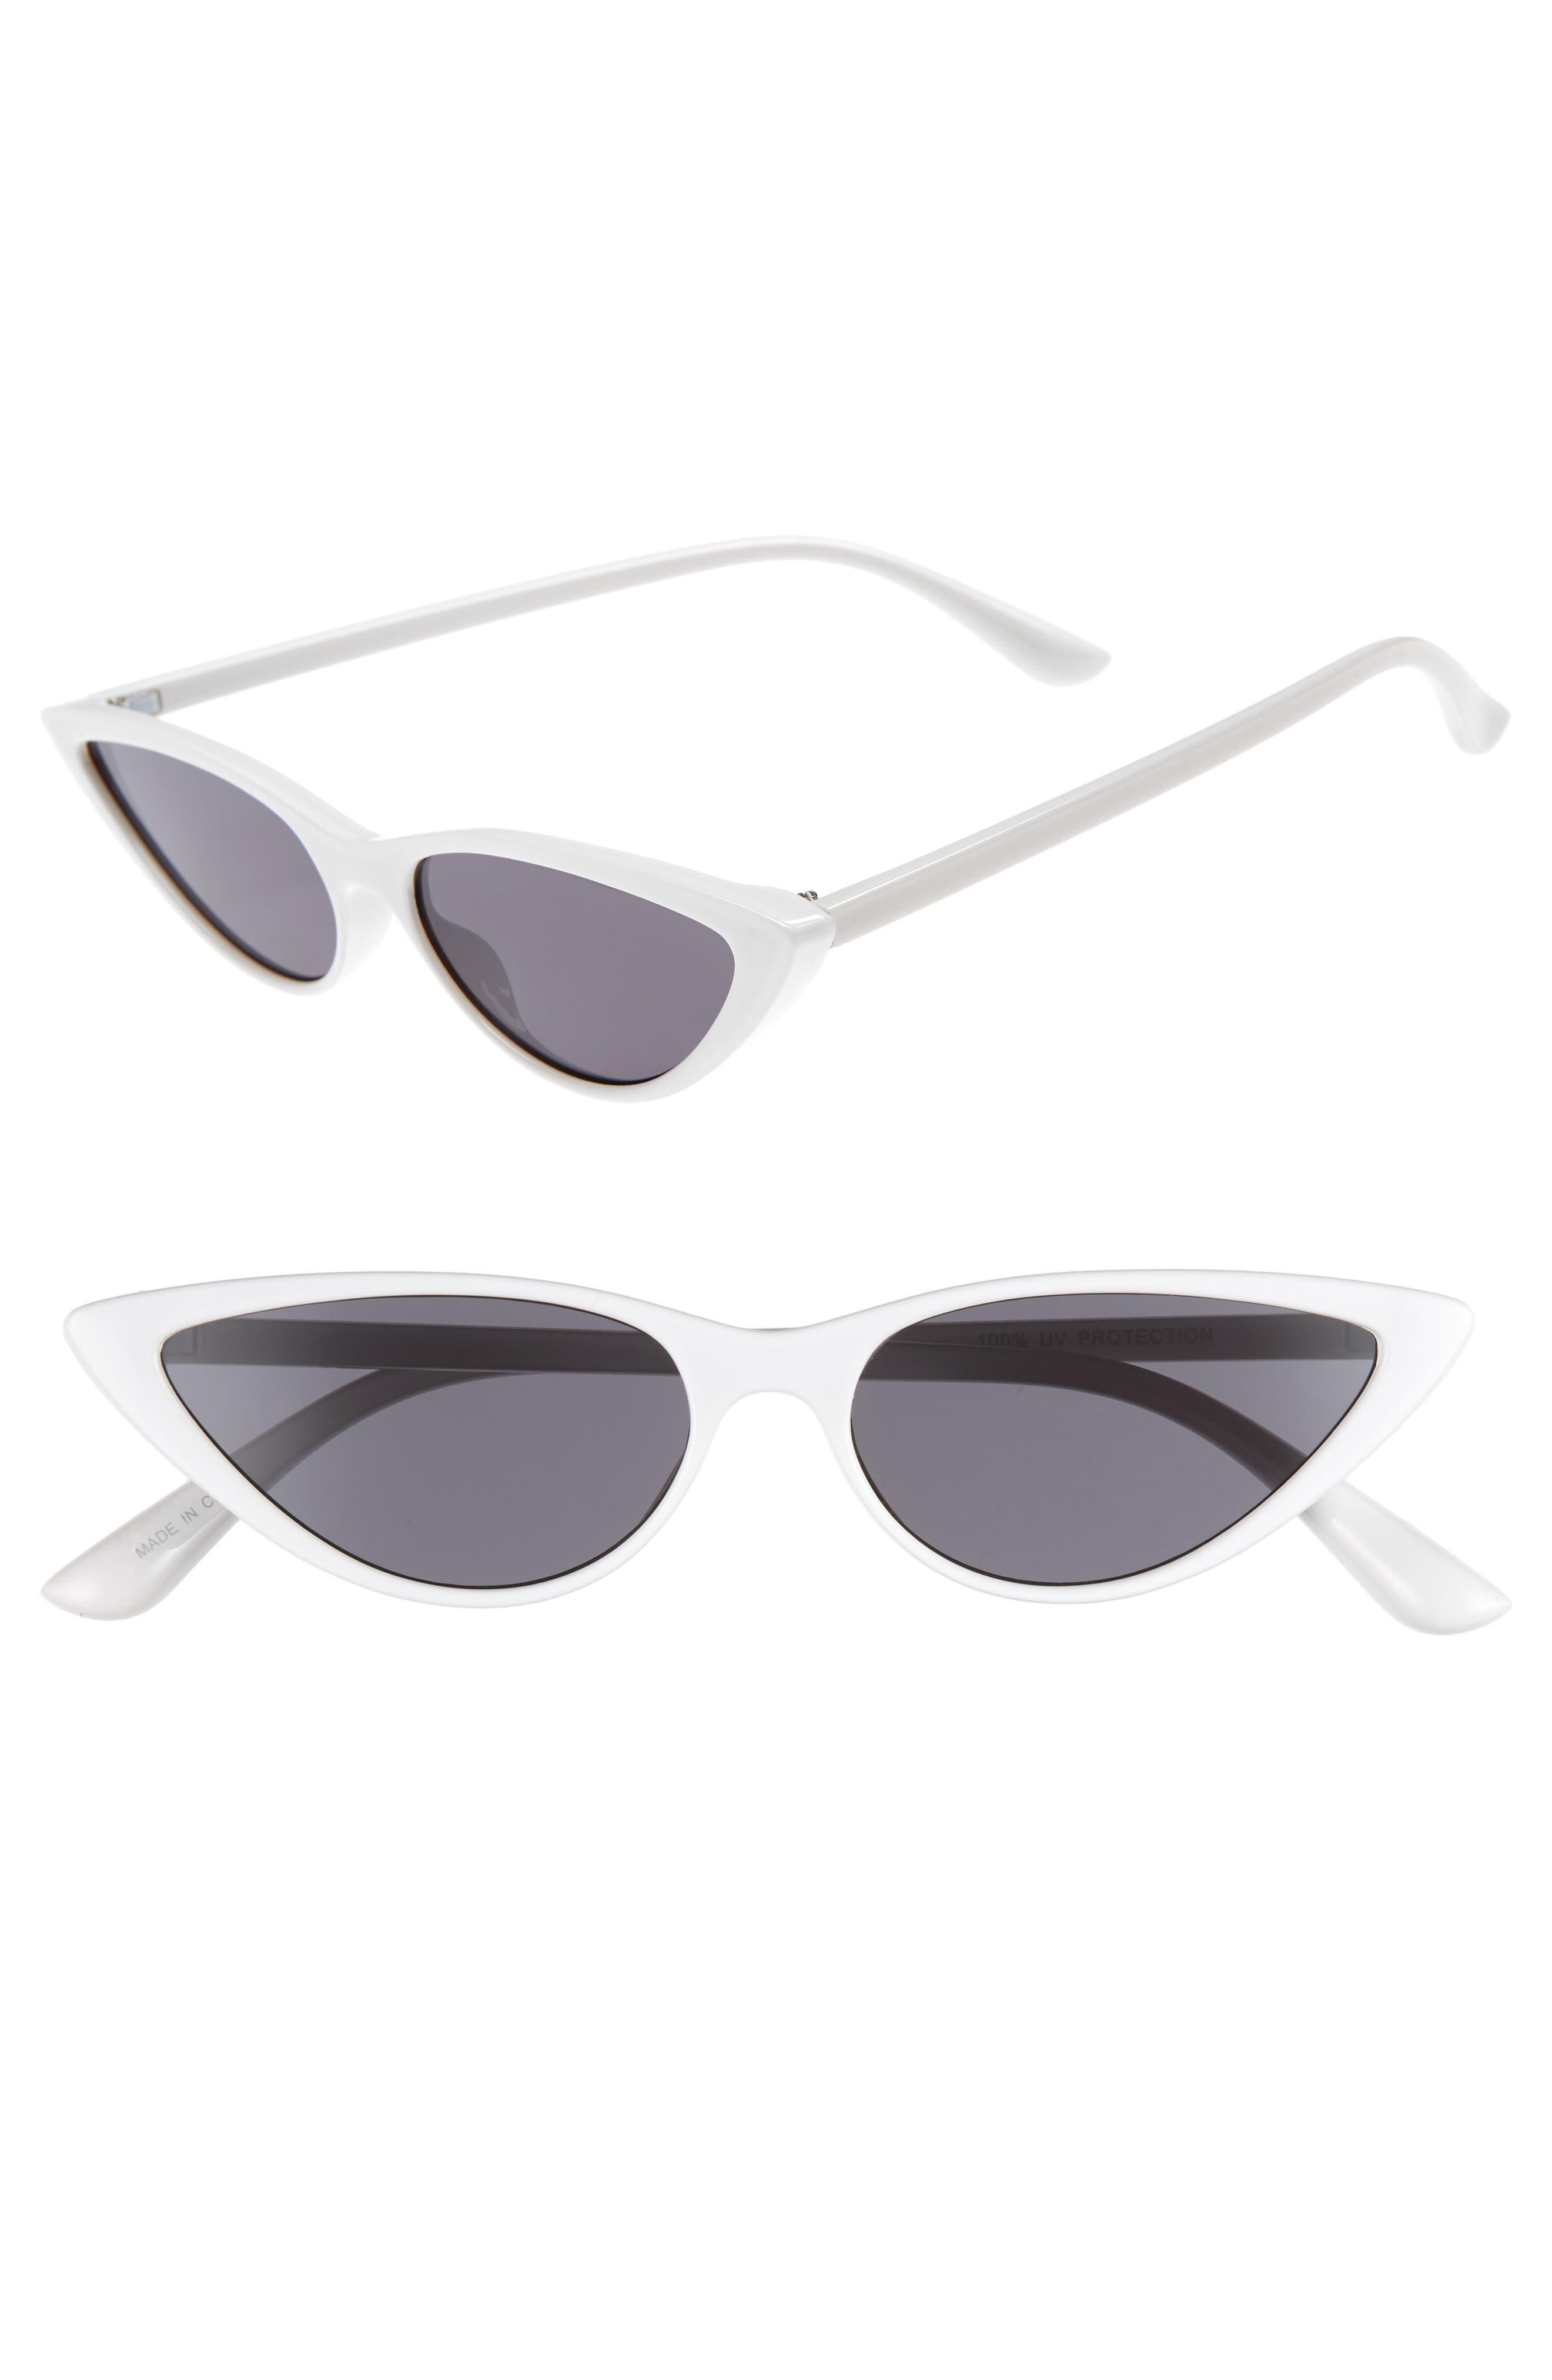 55mm Cat Eye Sunglasses,                             Main thumbnail 1, color,                             WHITE